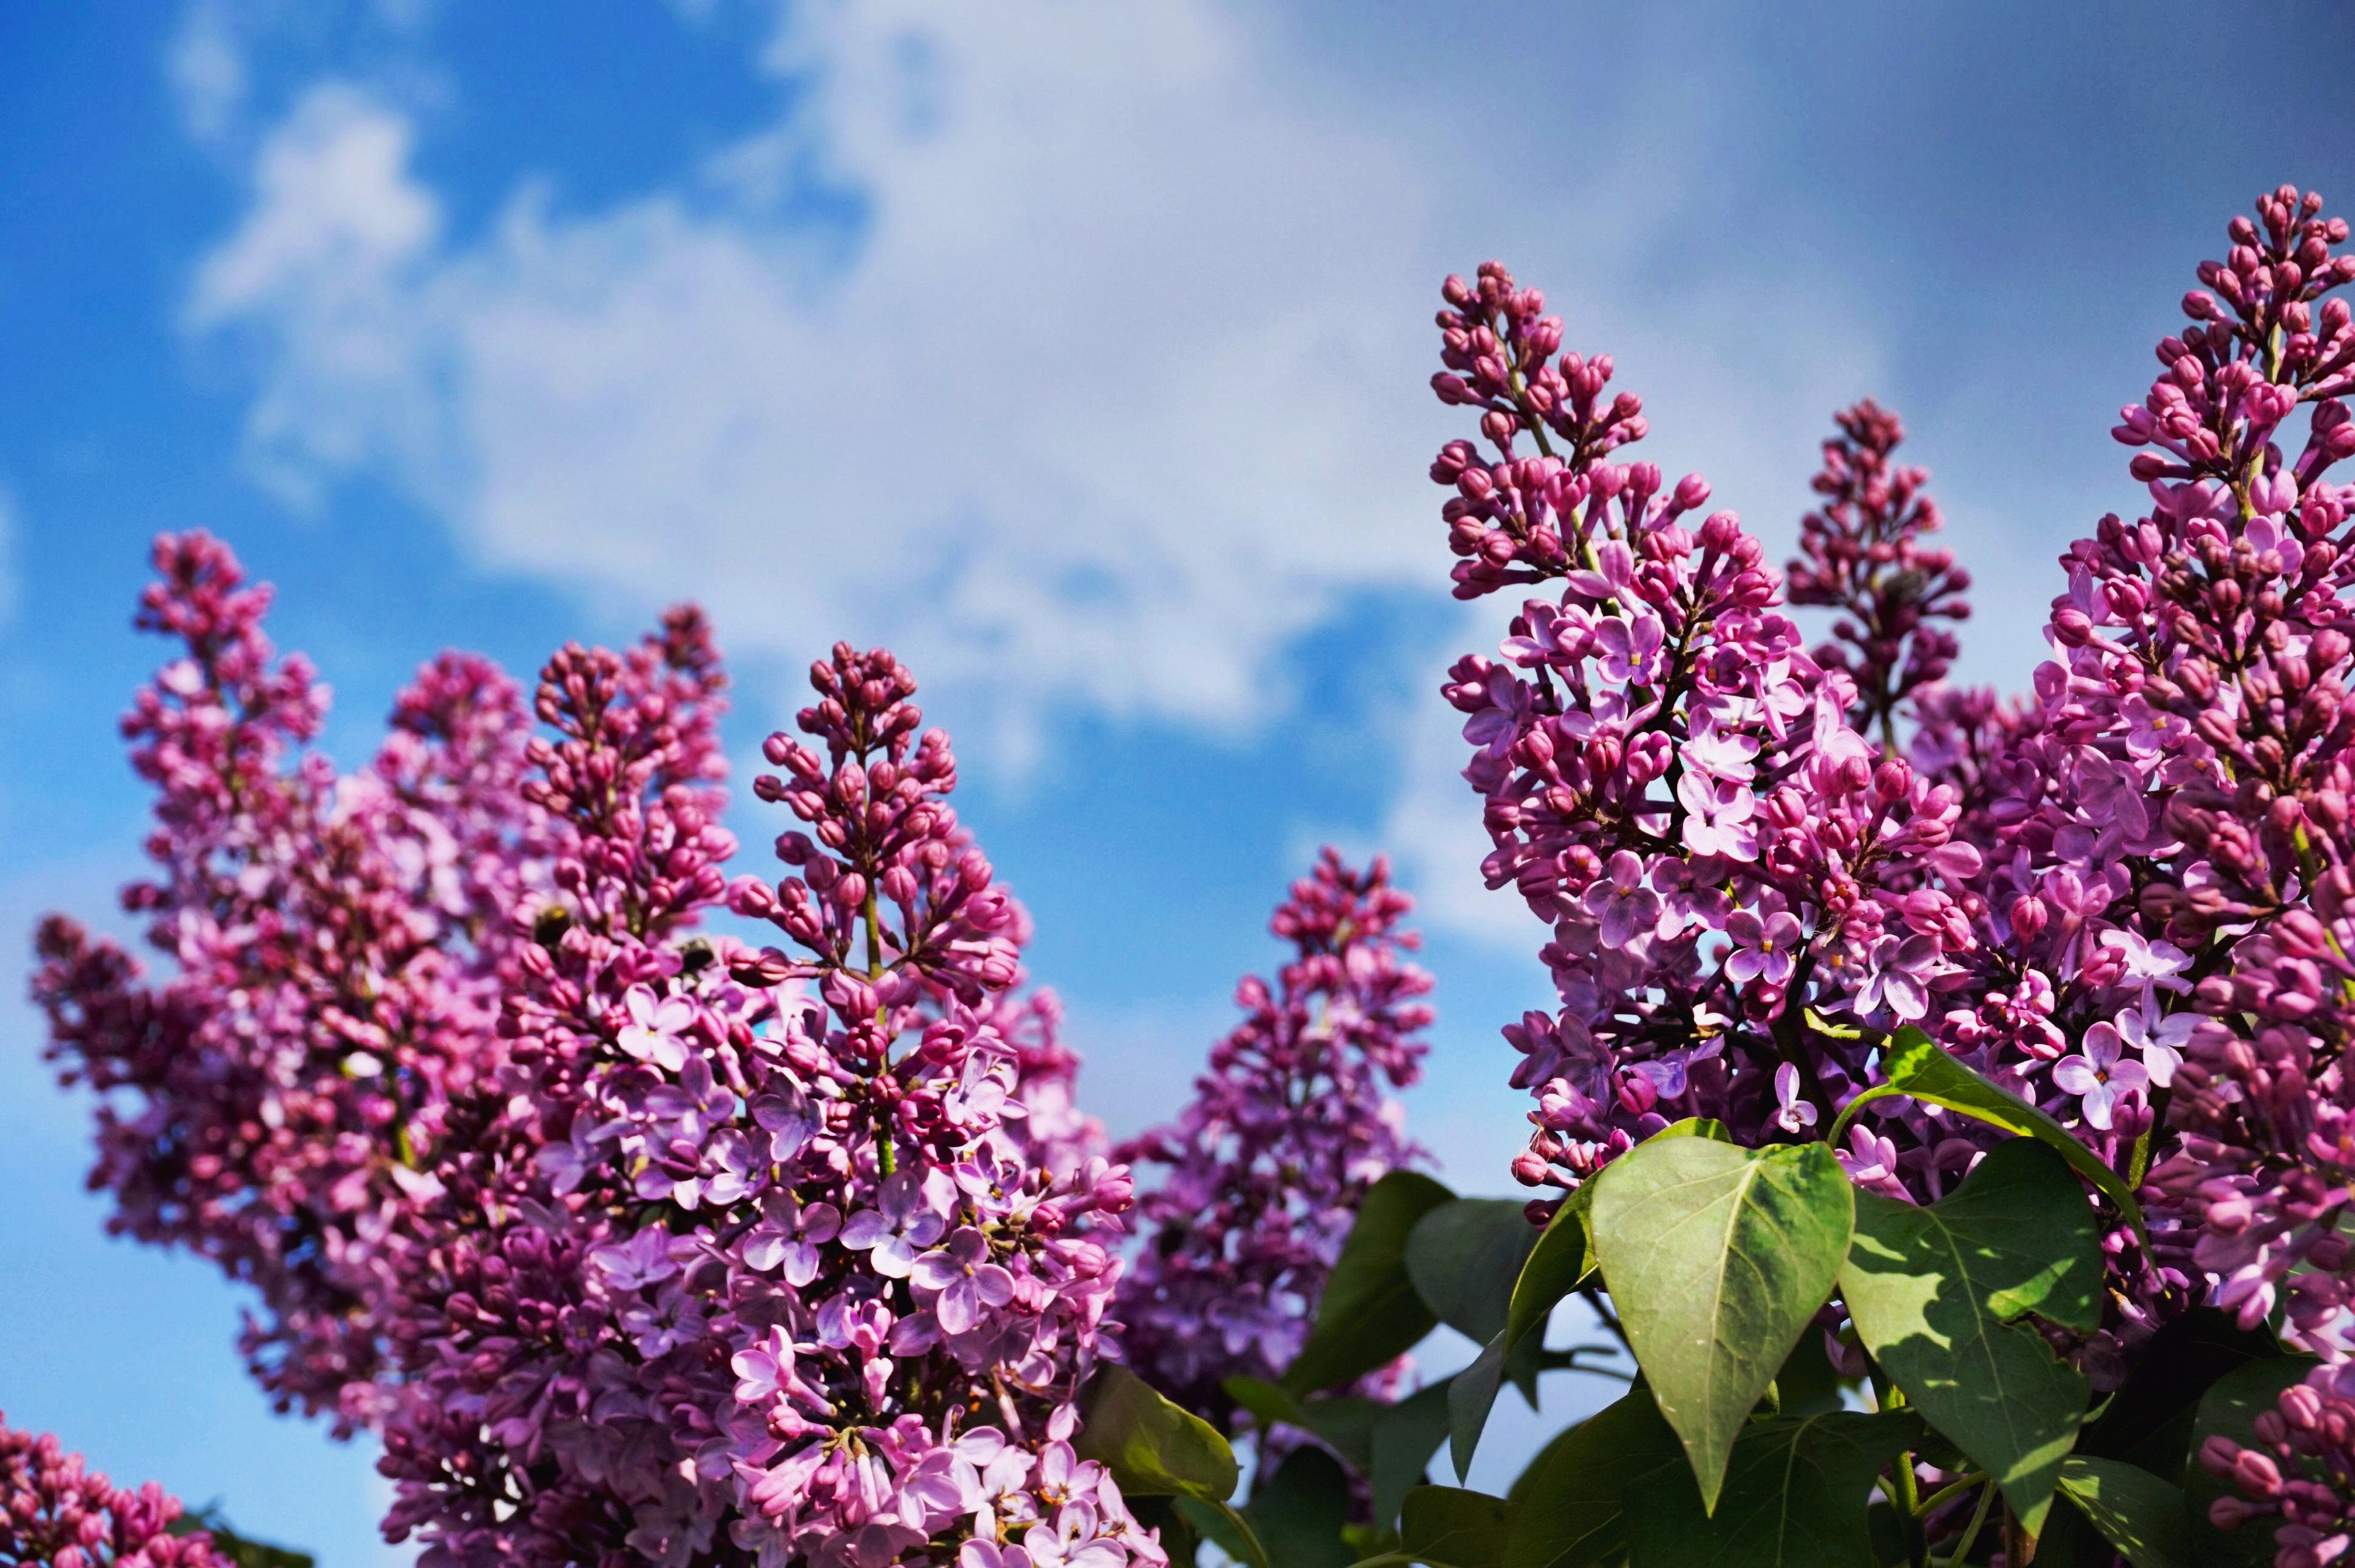 Lilacs blooming in purple against blue sky.